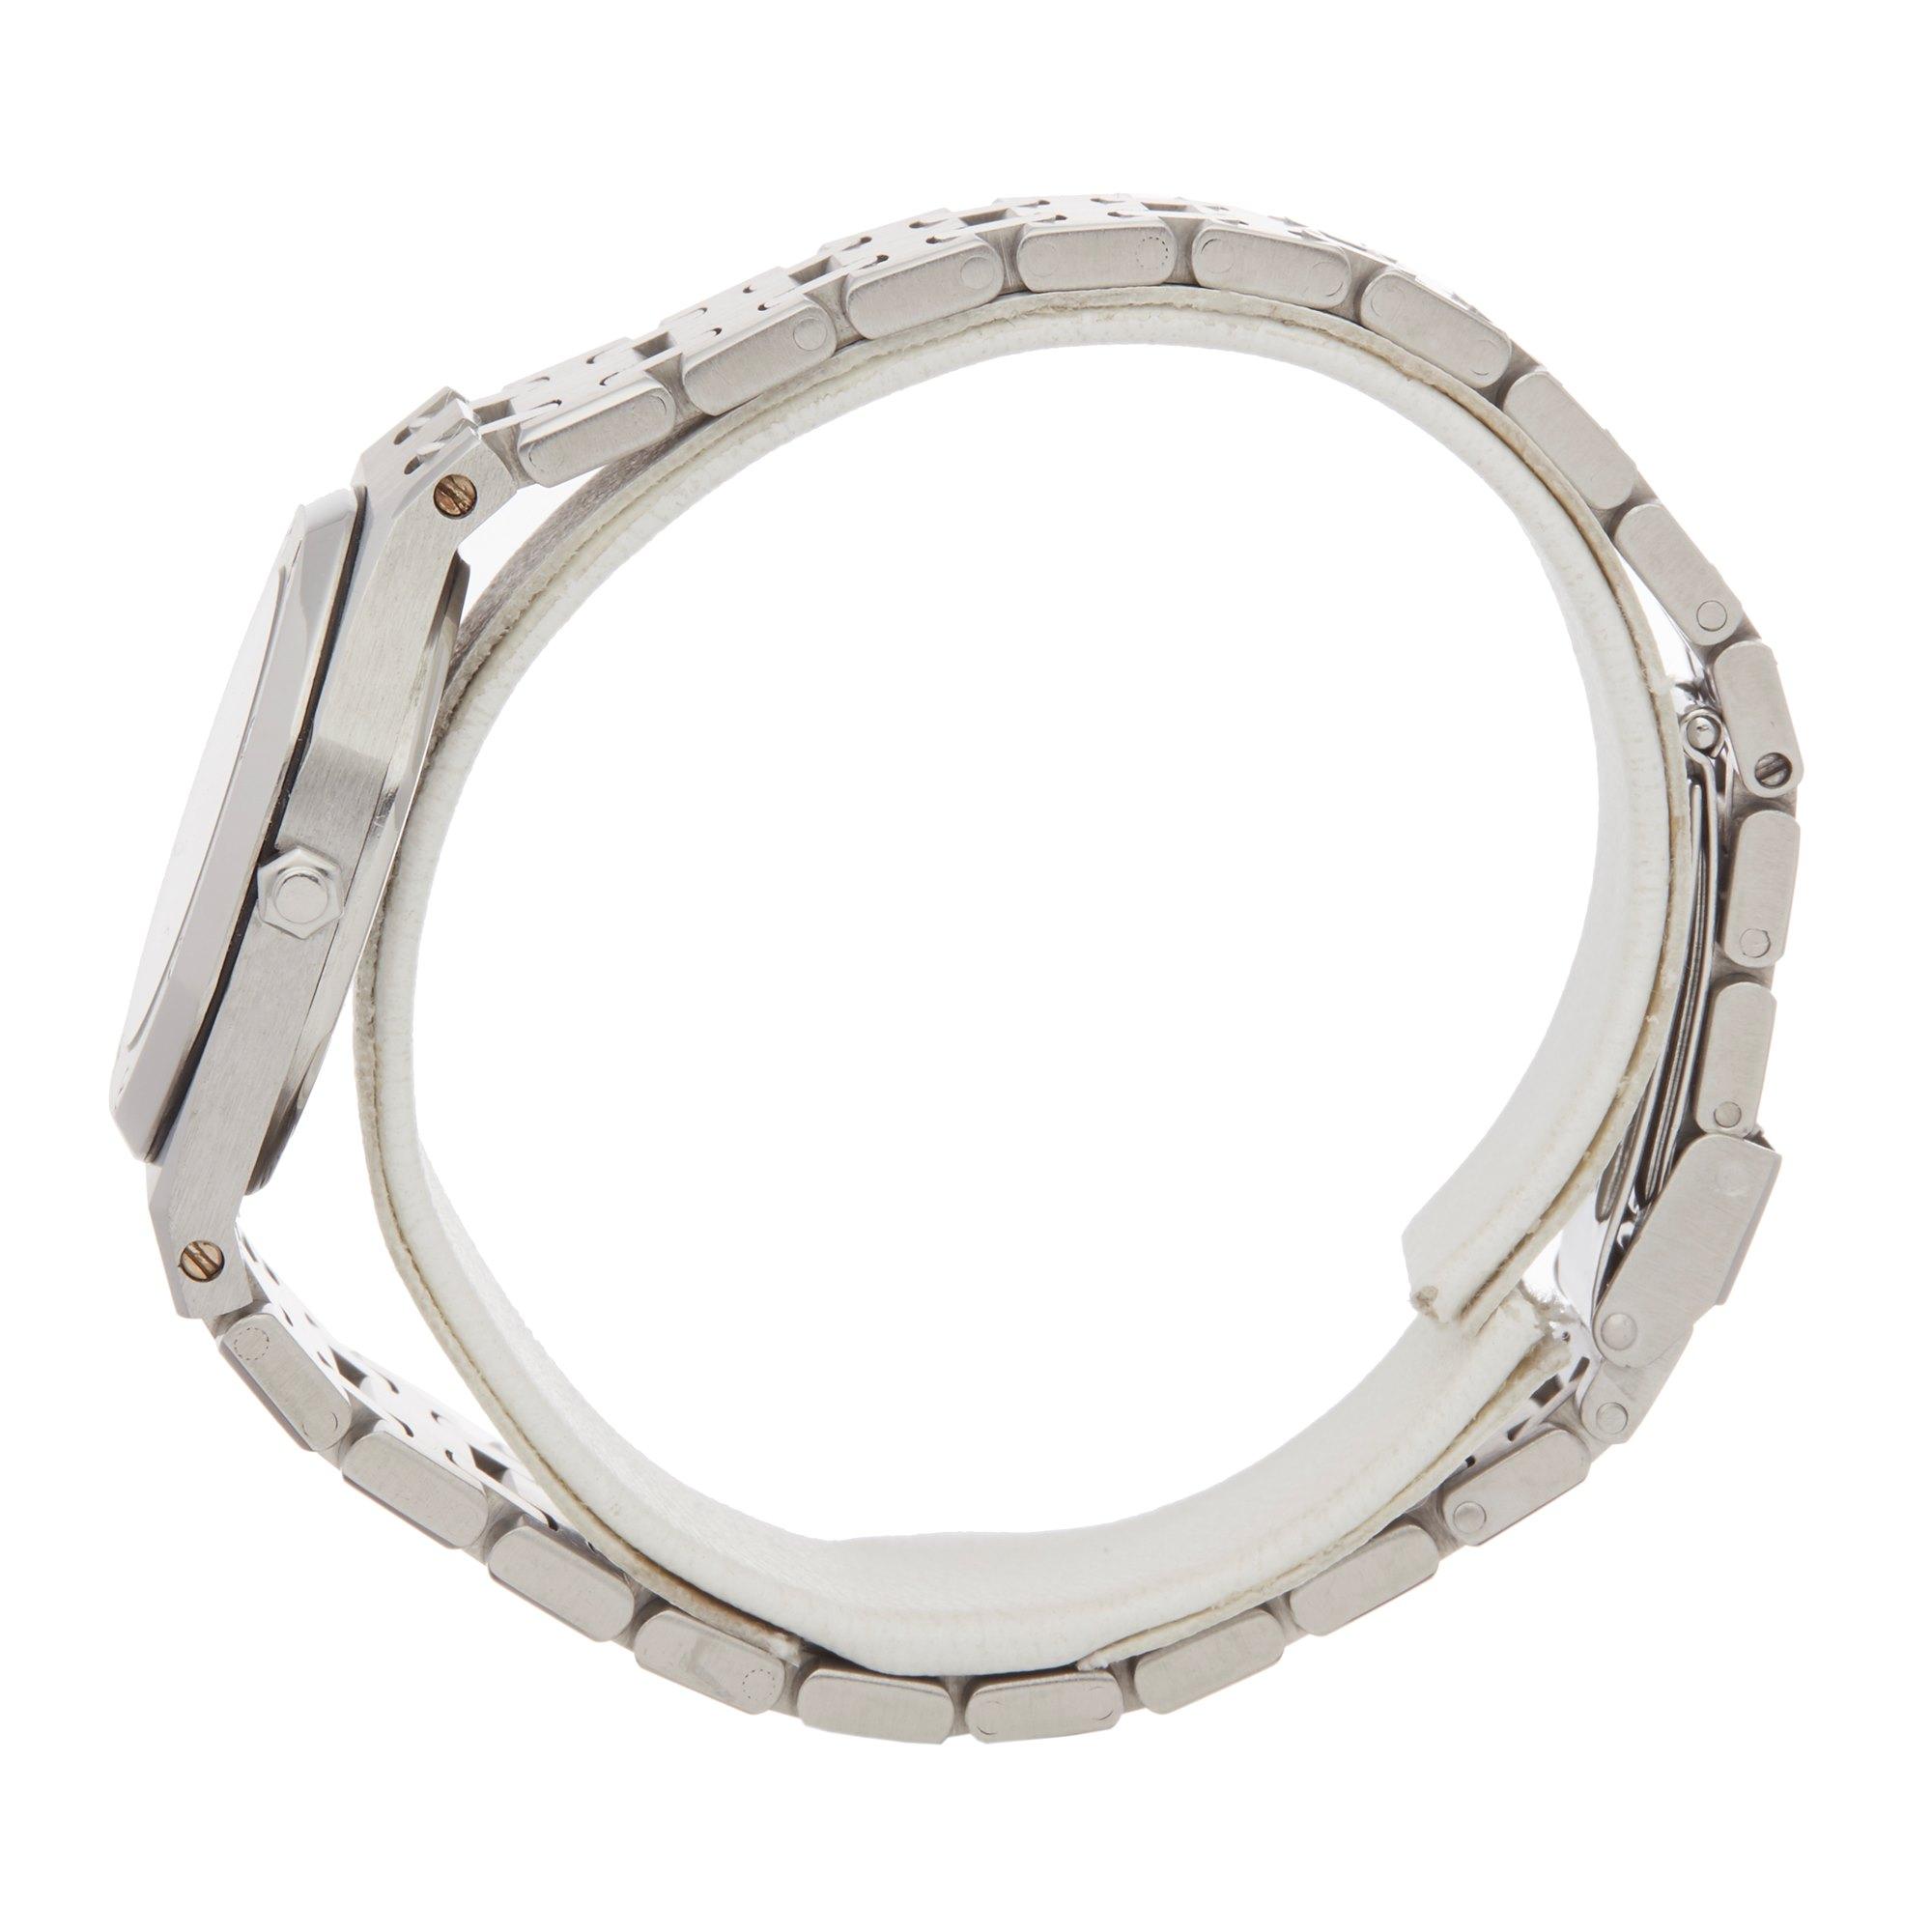 Audemars Piguet Royal Oak Lady Stainless Steel 203074